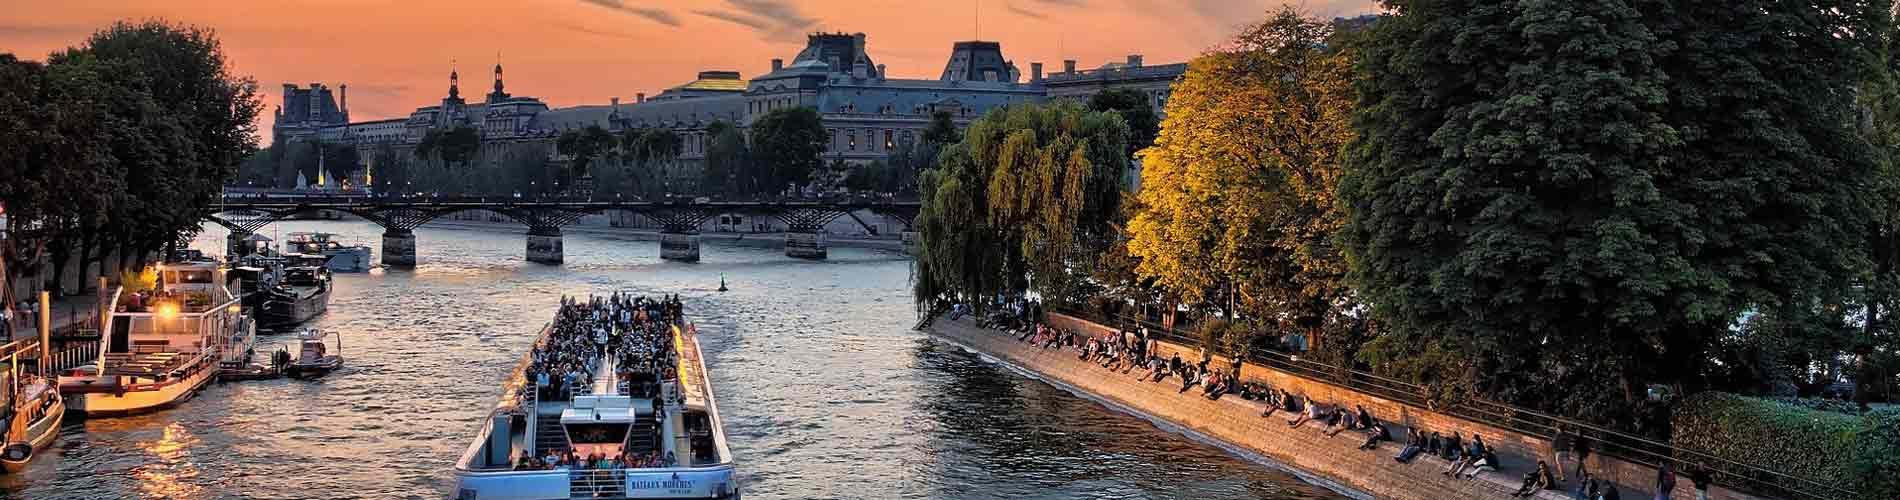 Blog_ValentinesDay_France_Paris_1900x500_Q120